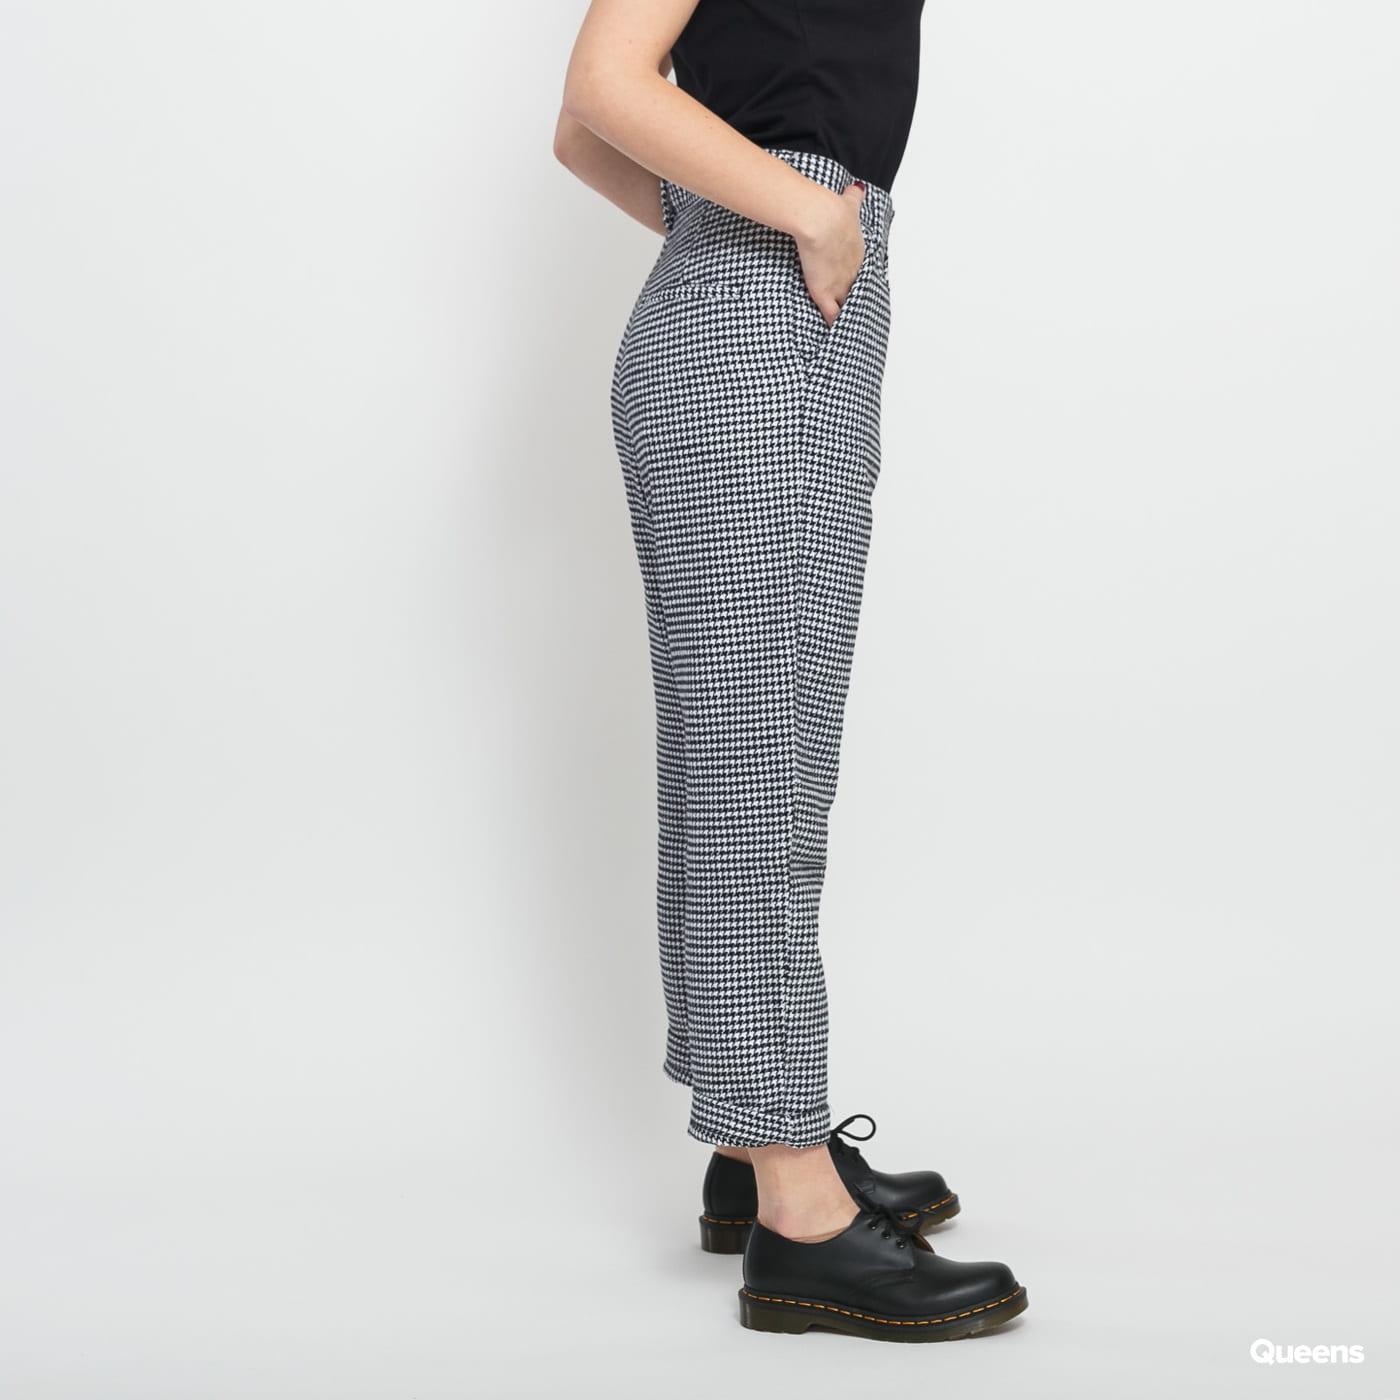 Carhartt WIP W' Norvell Pant biele / čierne